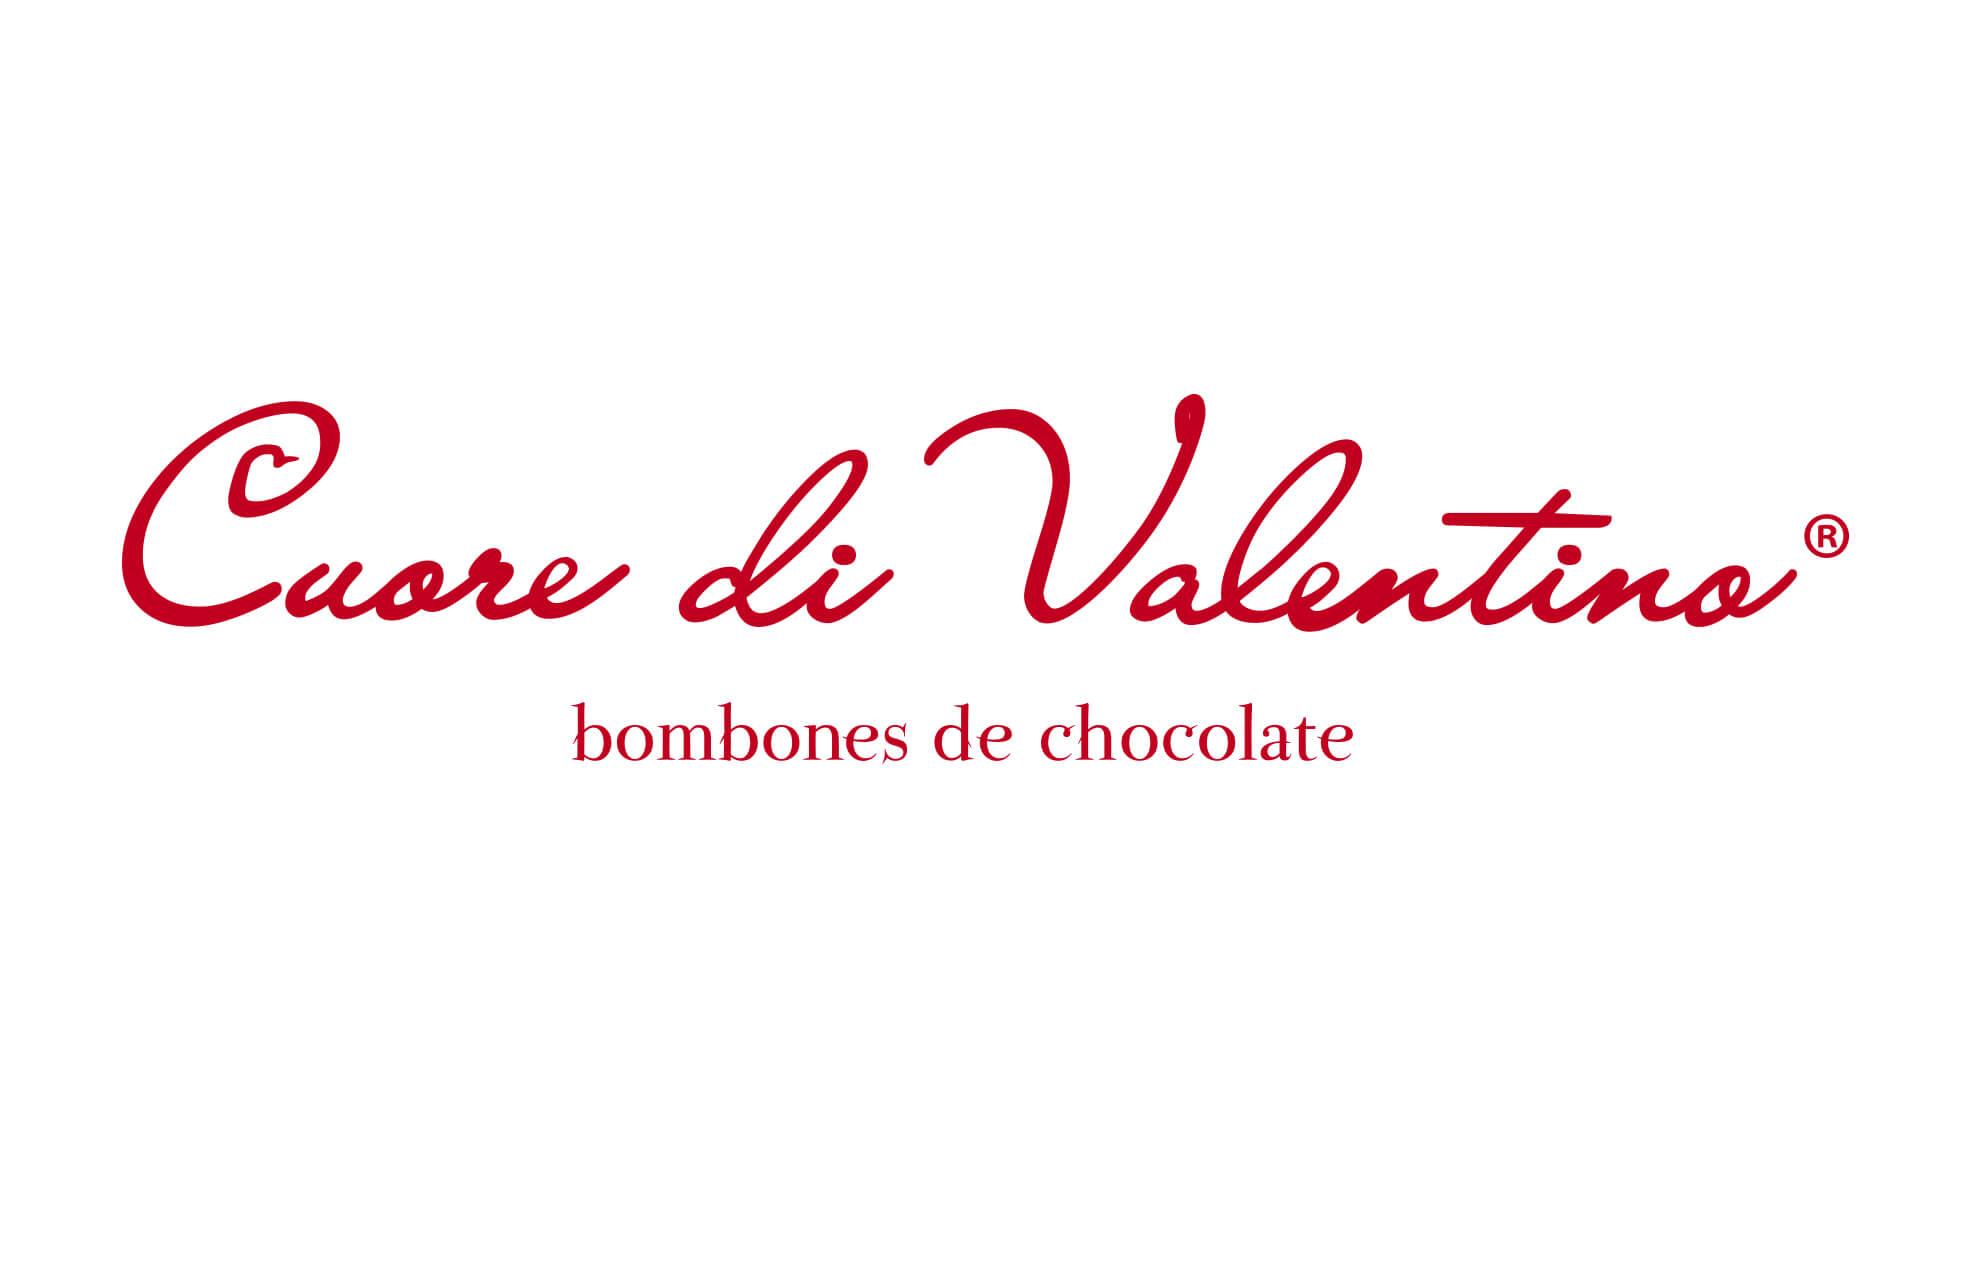 bombones chocolate logotipo1 - Logotipo para marca de bombones